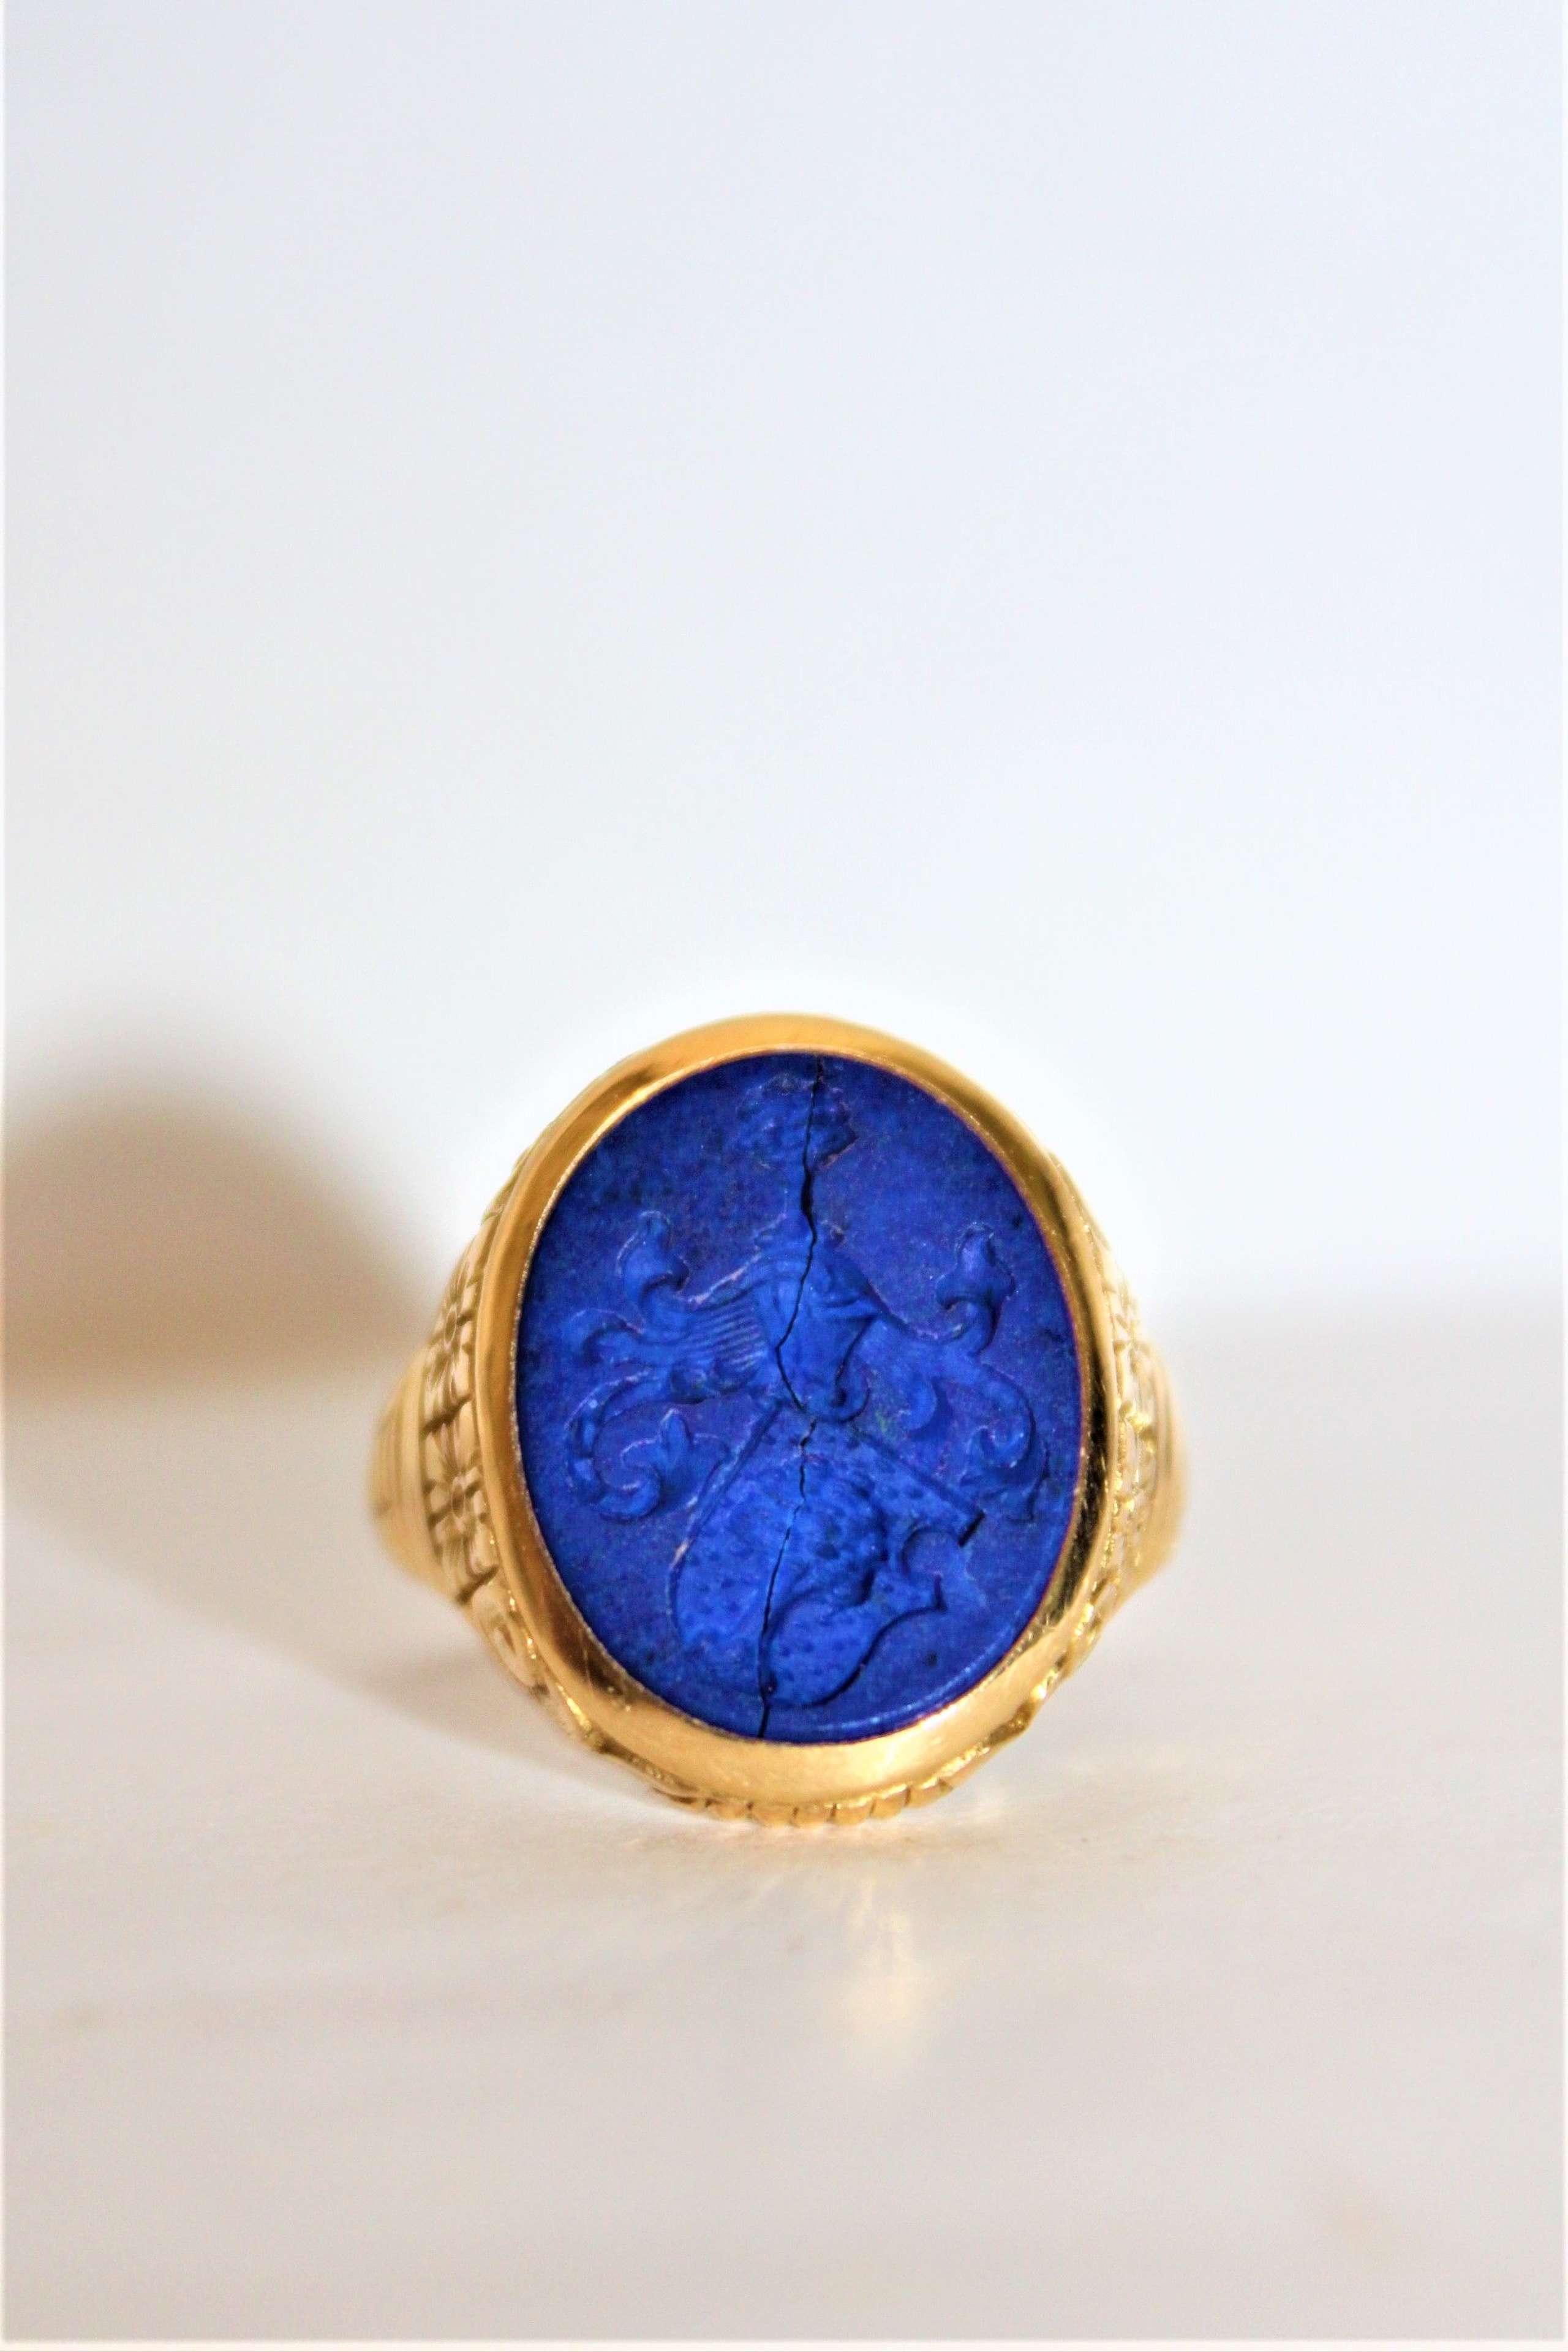 Unmarked gold intaglio lapis lazuli ring Circa 1880